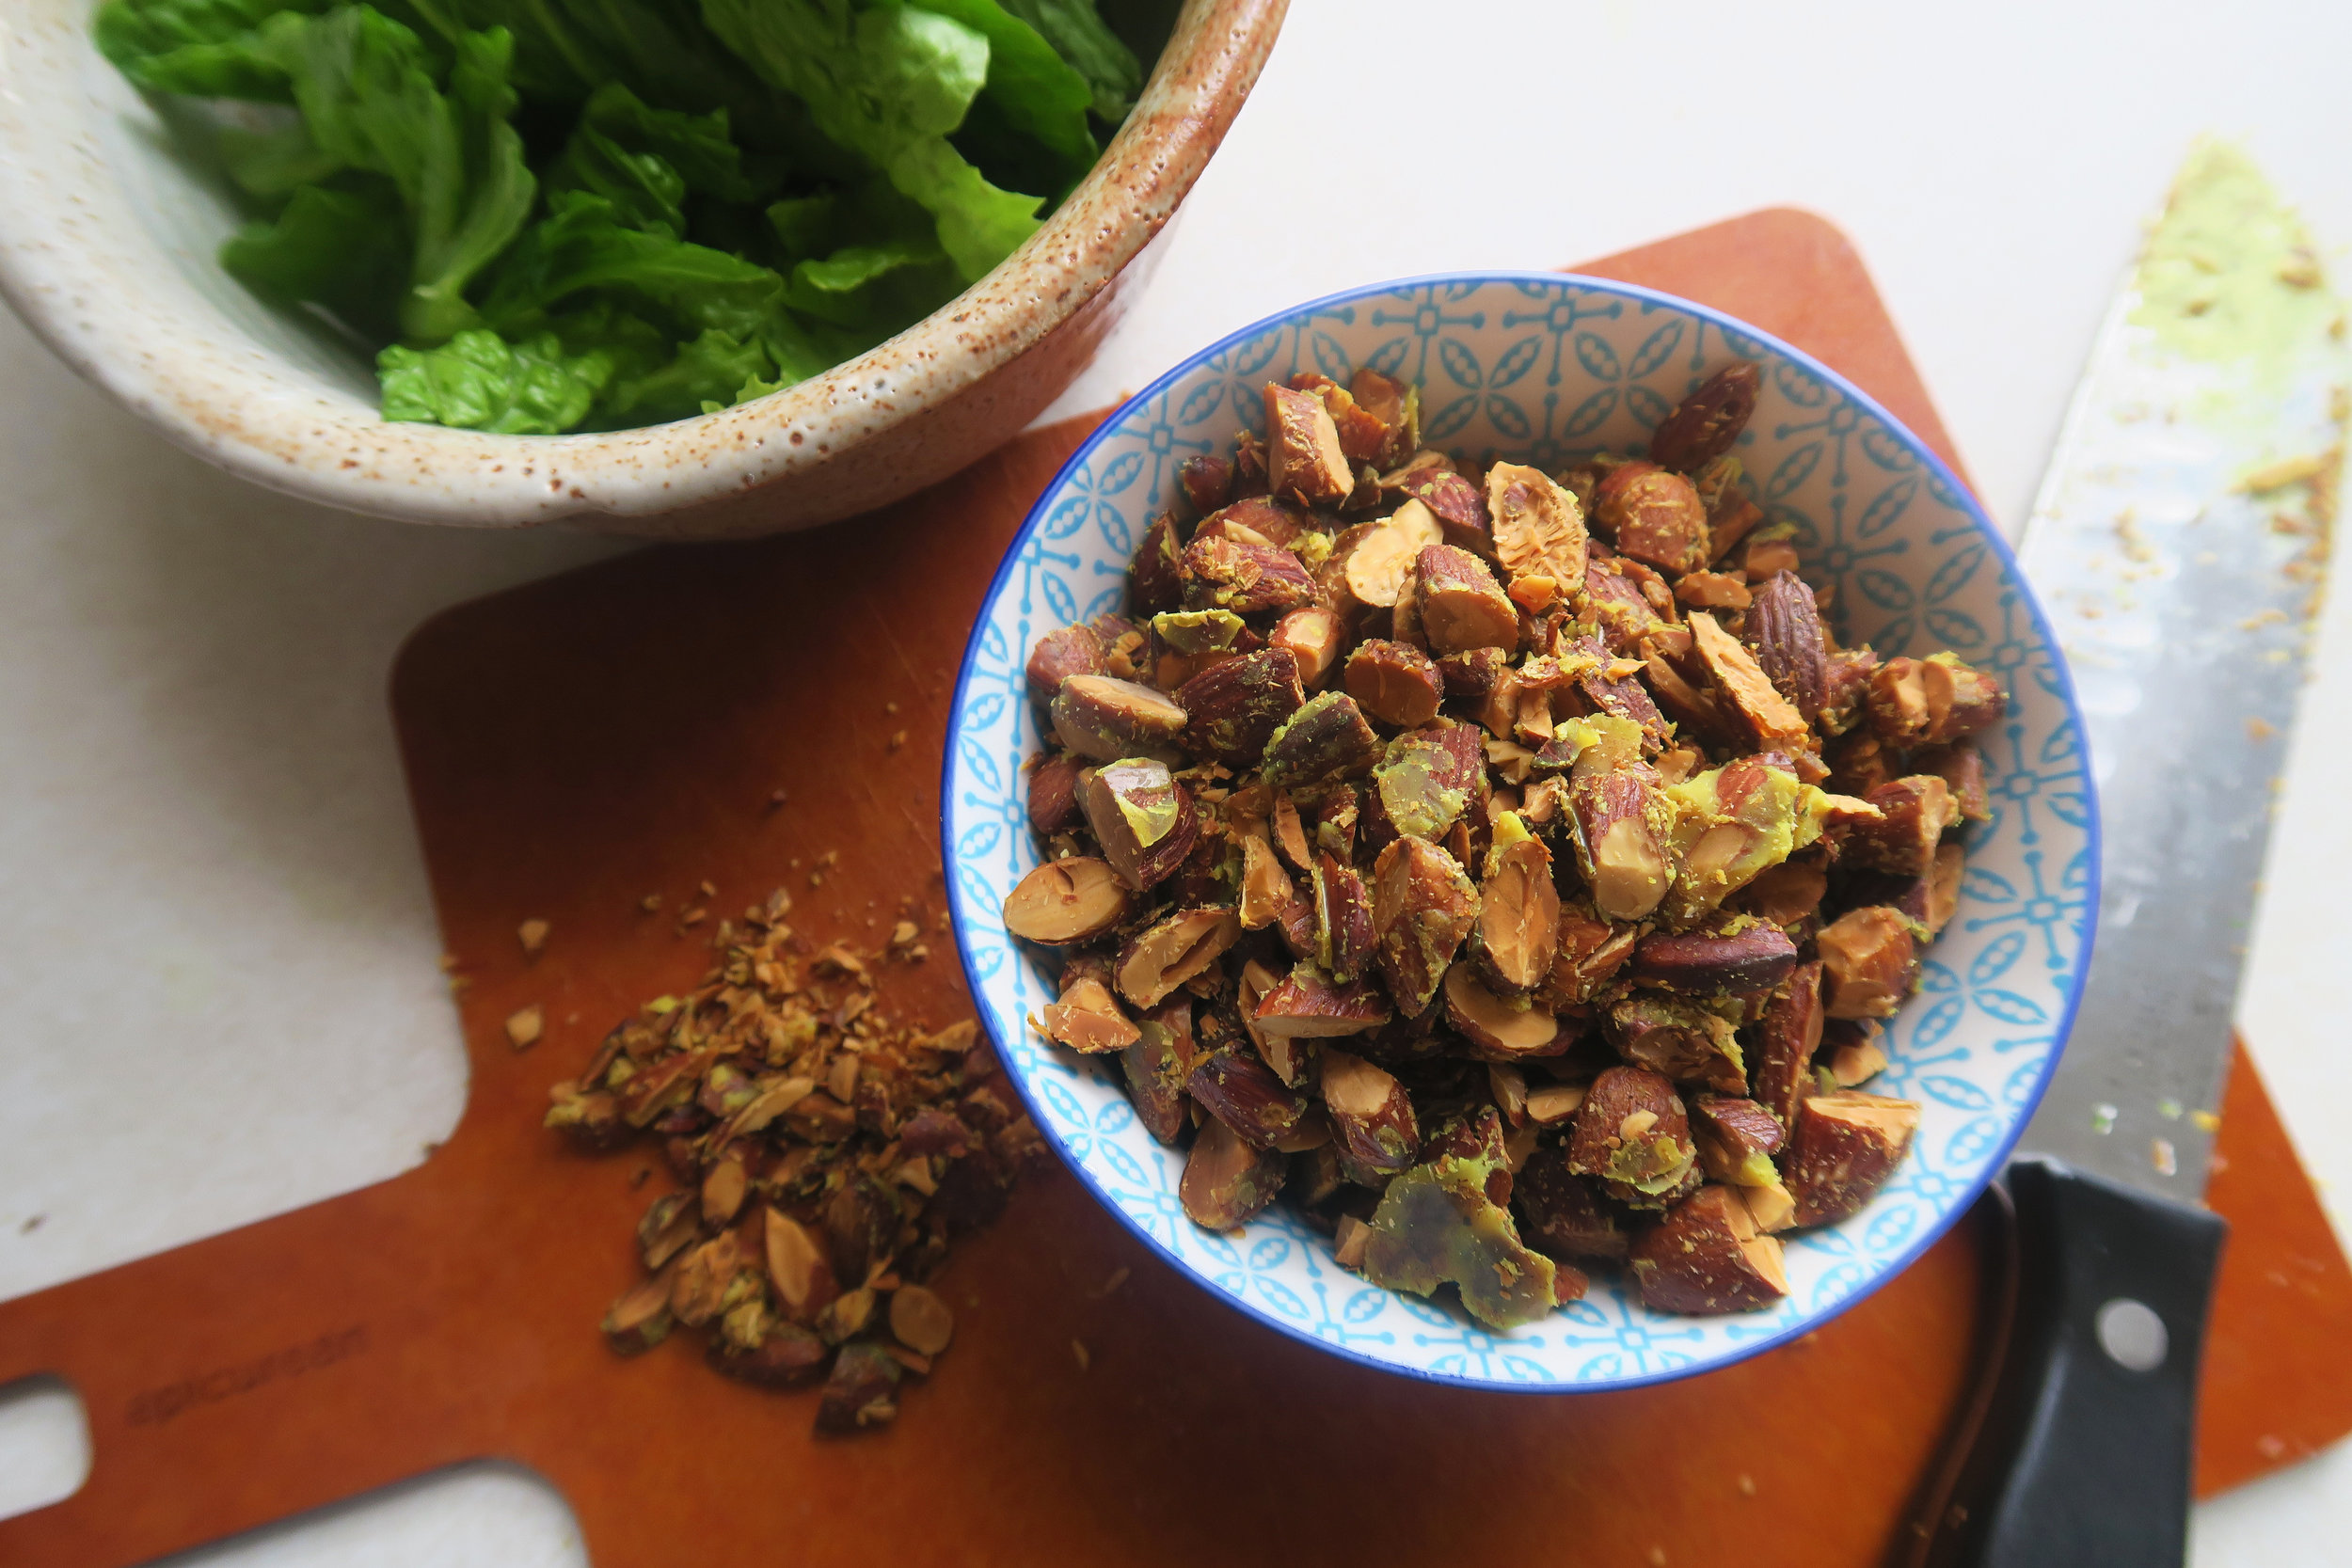 whole30, whole30 recipes, paleo, paleo recipes, salad, crouton recipe, vegan, vegetarian, healthy recipes, almonds